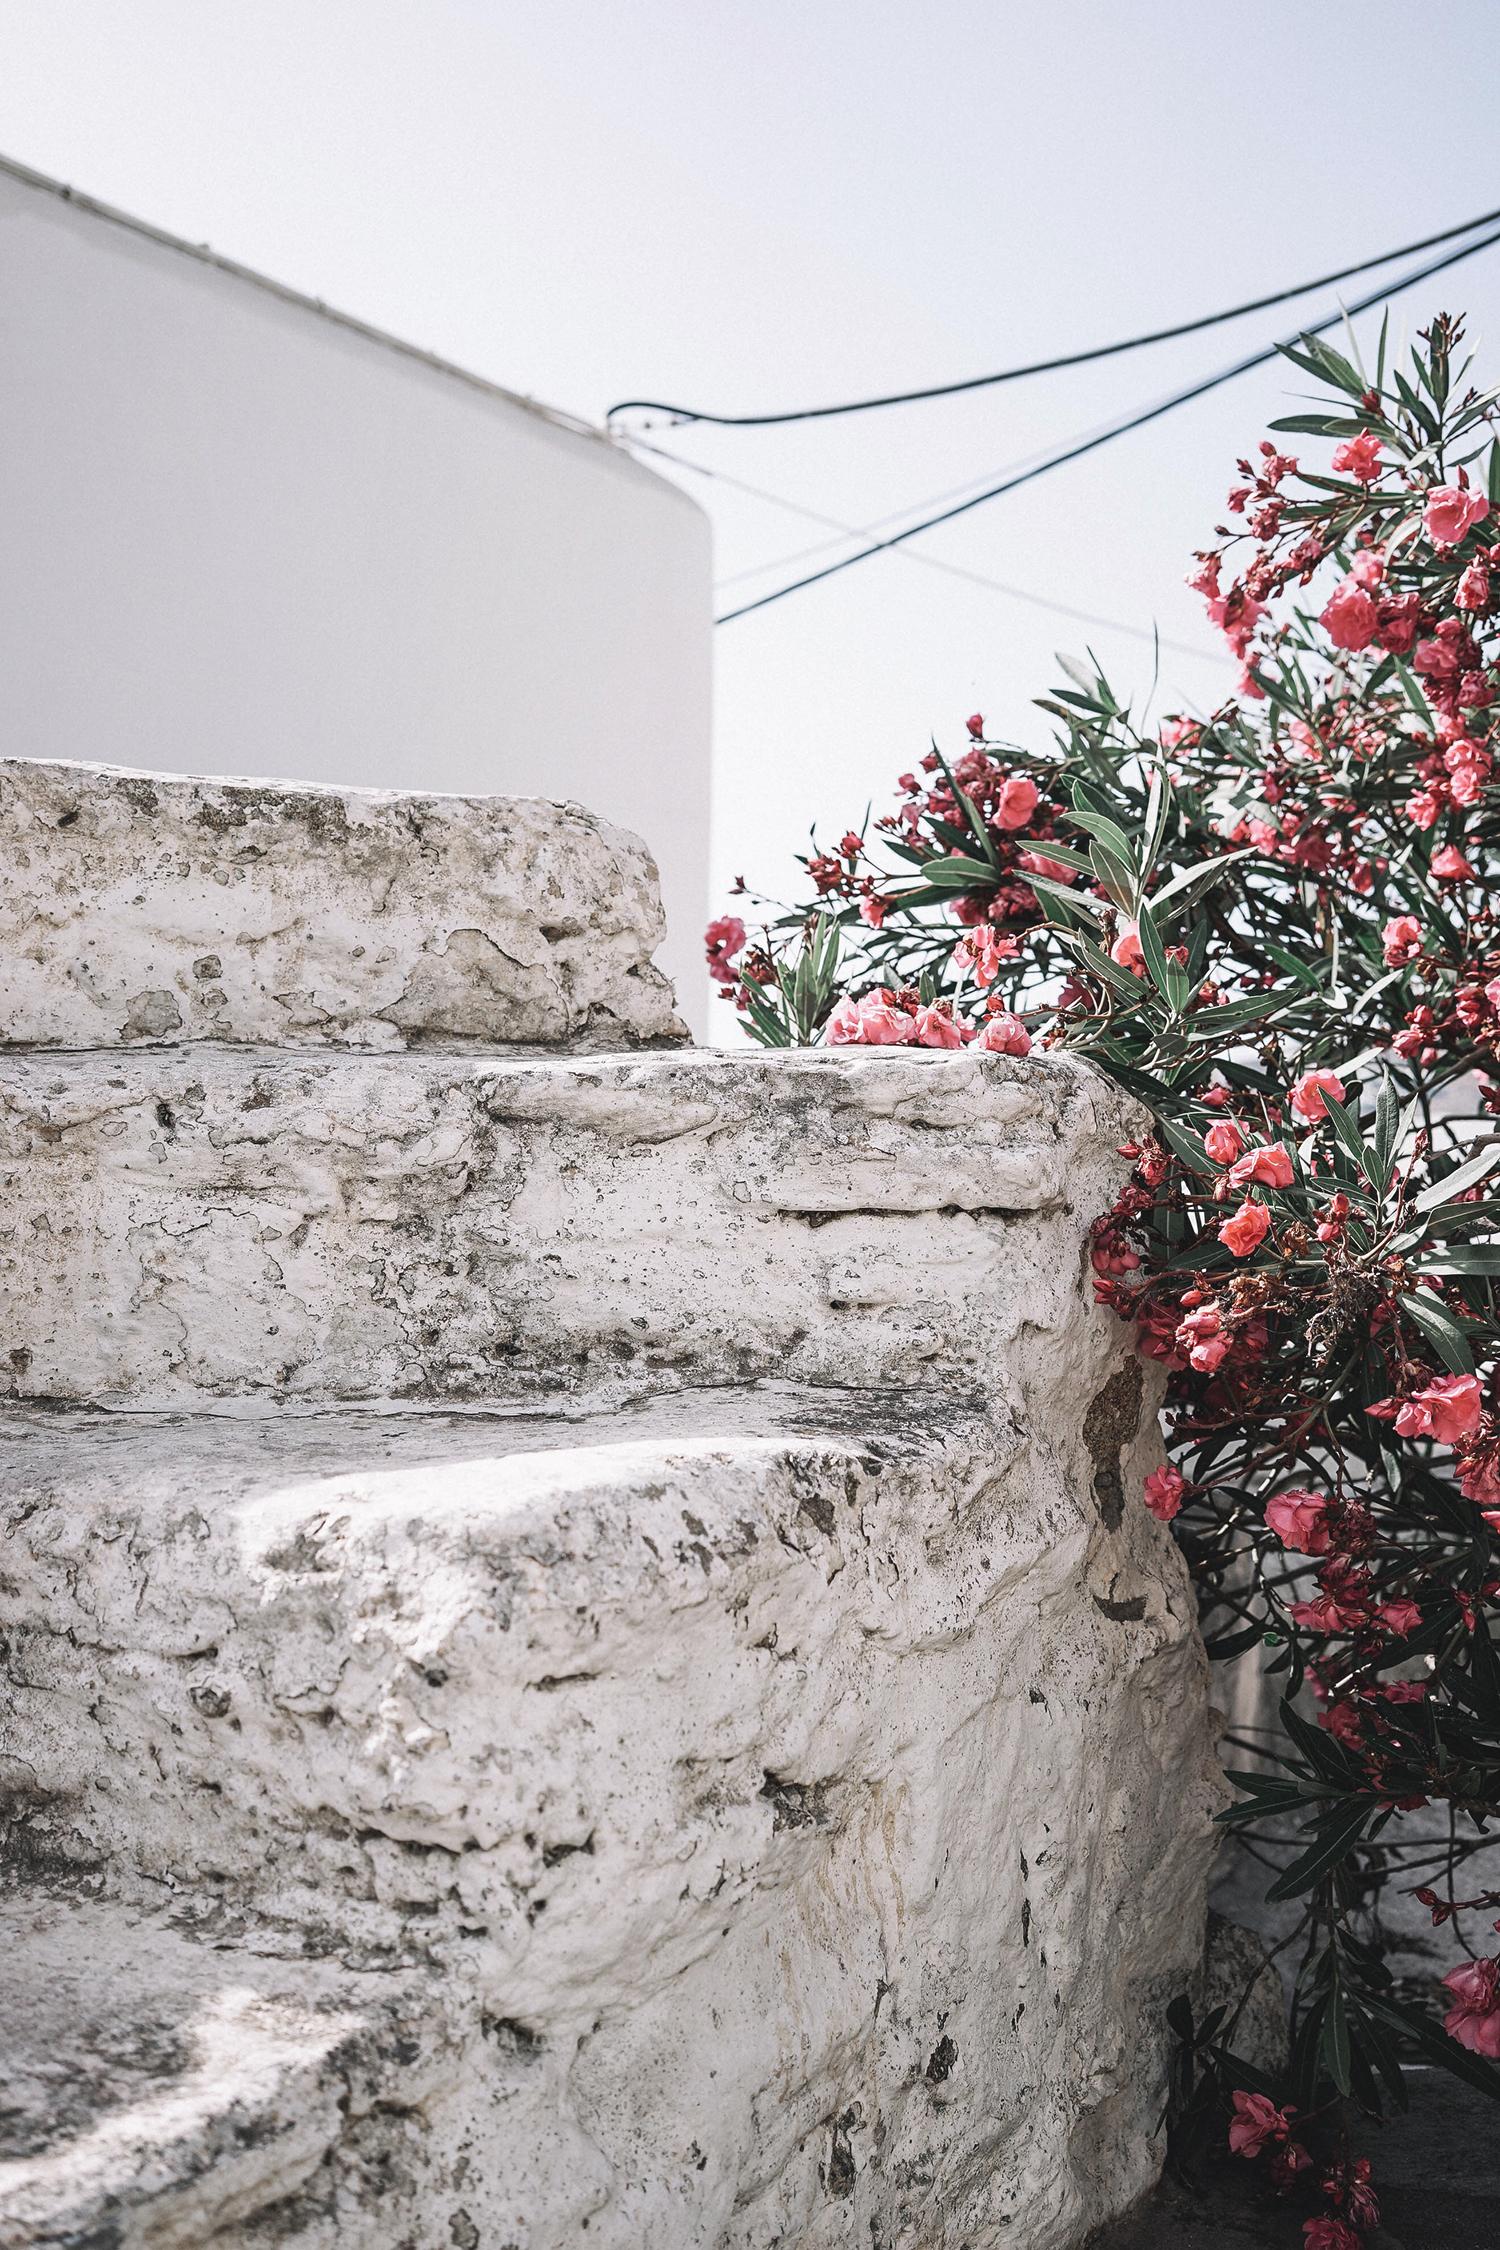 Lace_up_Blouse-Ralph_Lauren-Soludos_Espadrilles-Soludos_Escapes-Skirt-Straw_Hat-Canotier-Lack_Of_Color-Street_Style-Mykonos-Greece-Collage_Vintage-112